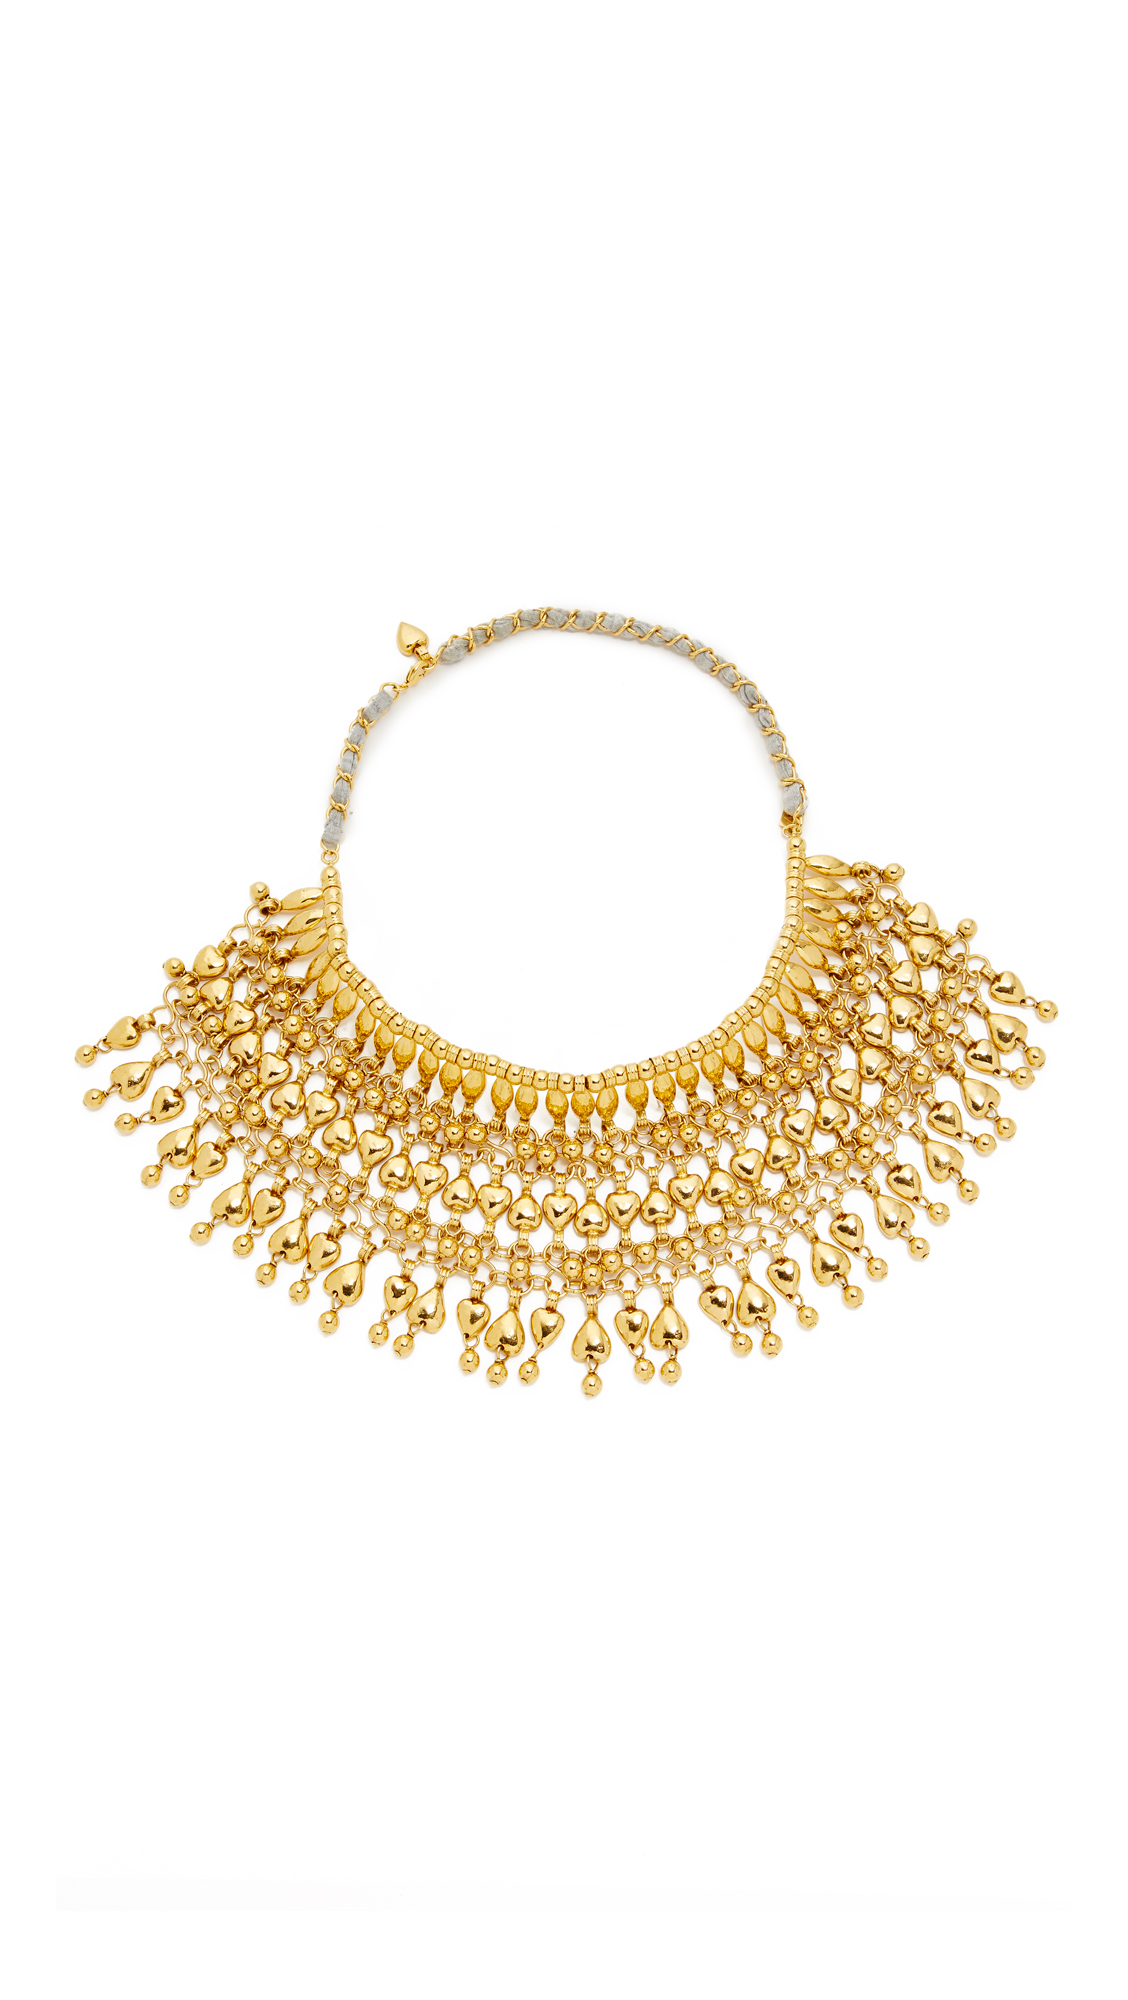 Aurelie Bidermann Heart Beaded Bib Necklace - Gold